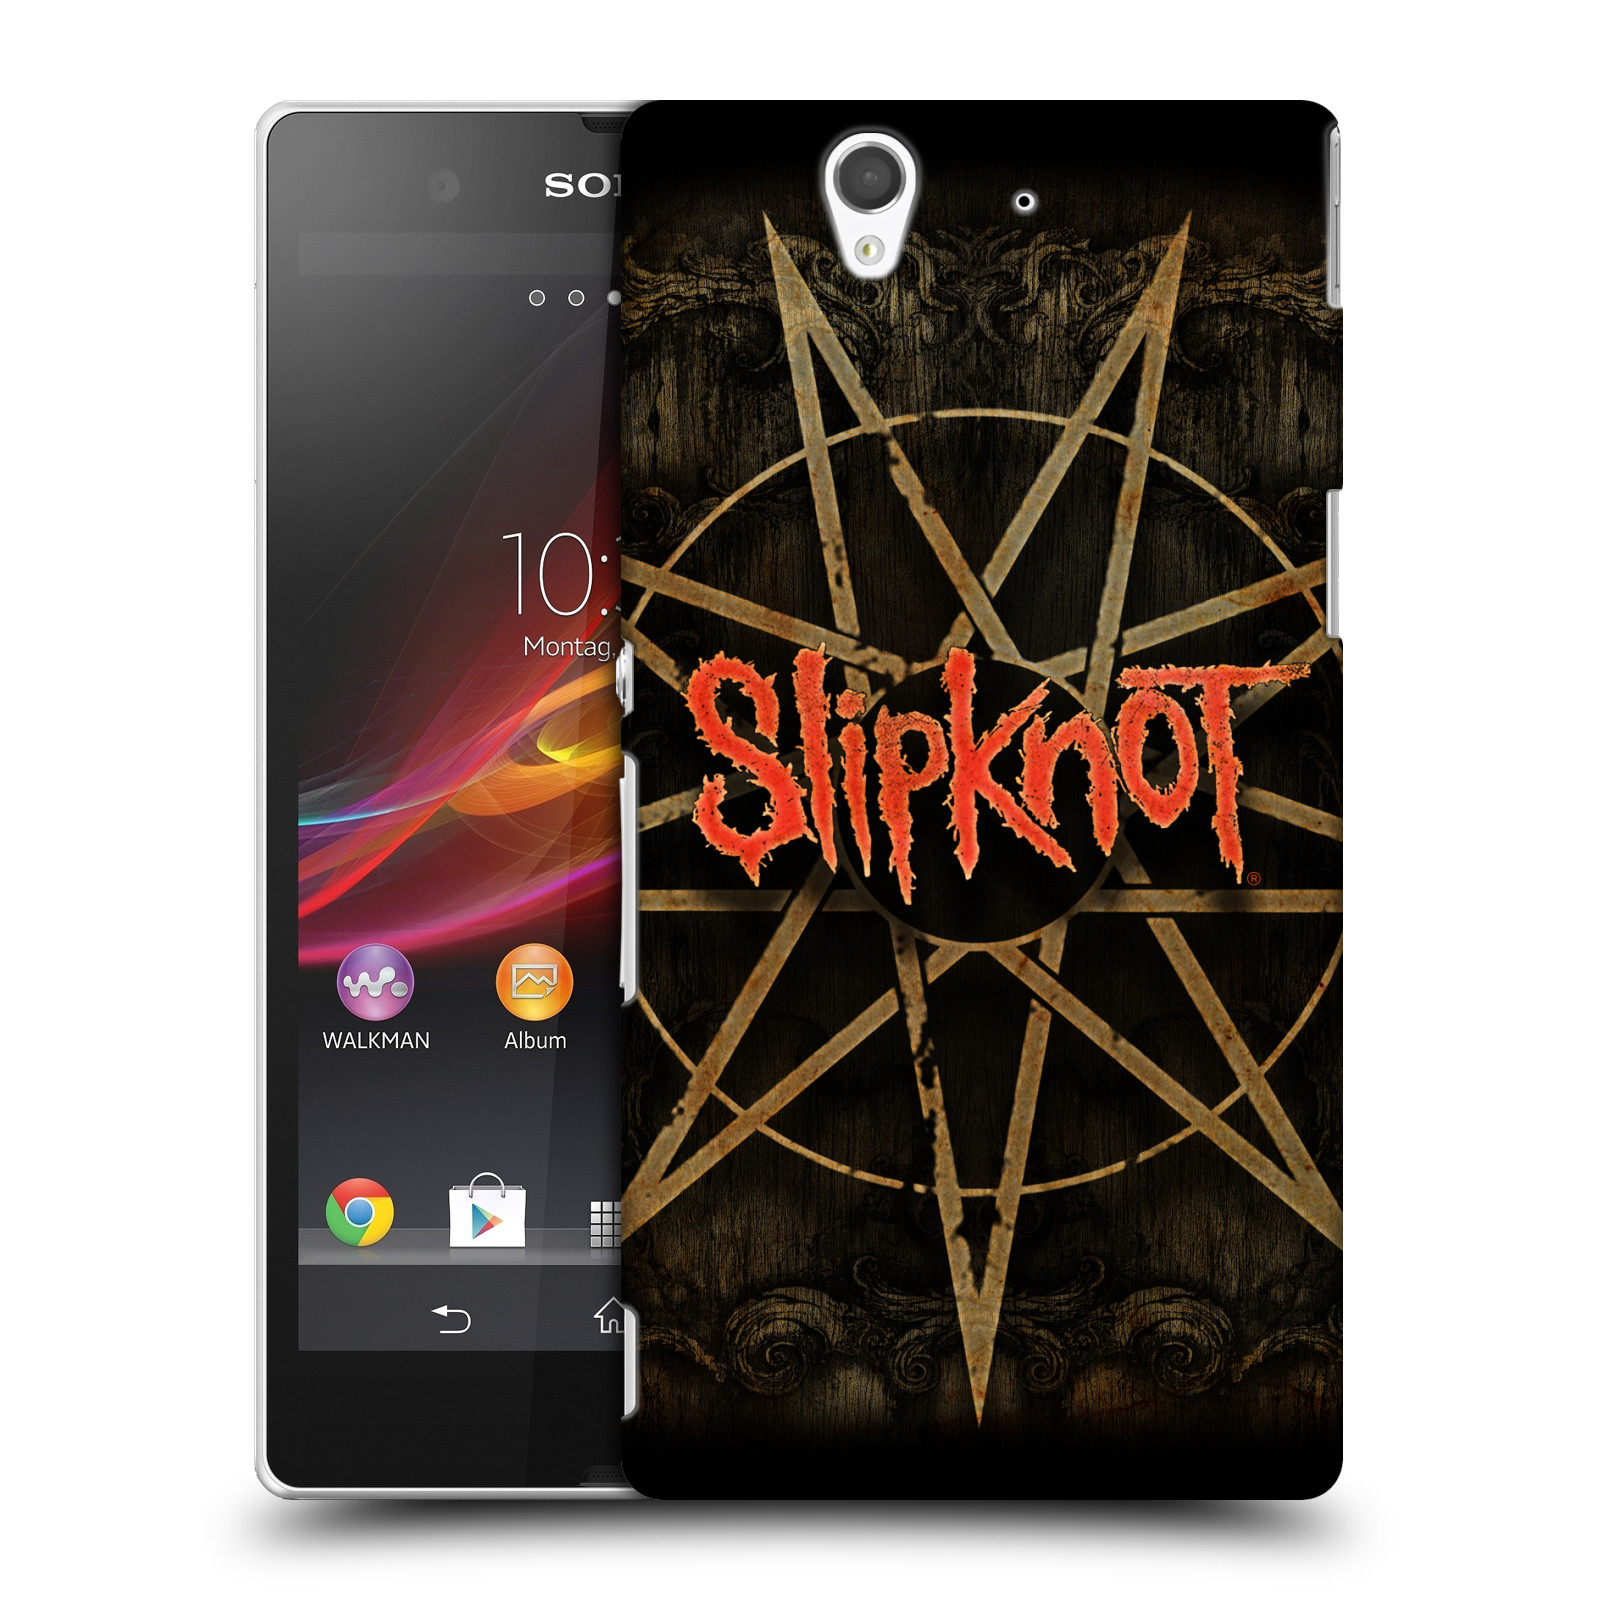 Plastové pouzdro na mobil Sony Xperia Z C6603 HEAD CASE Slipknot - Znak